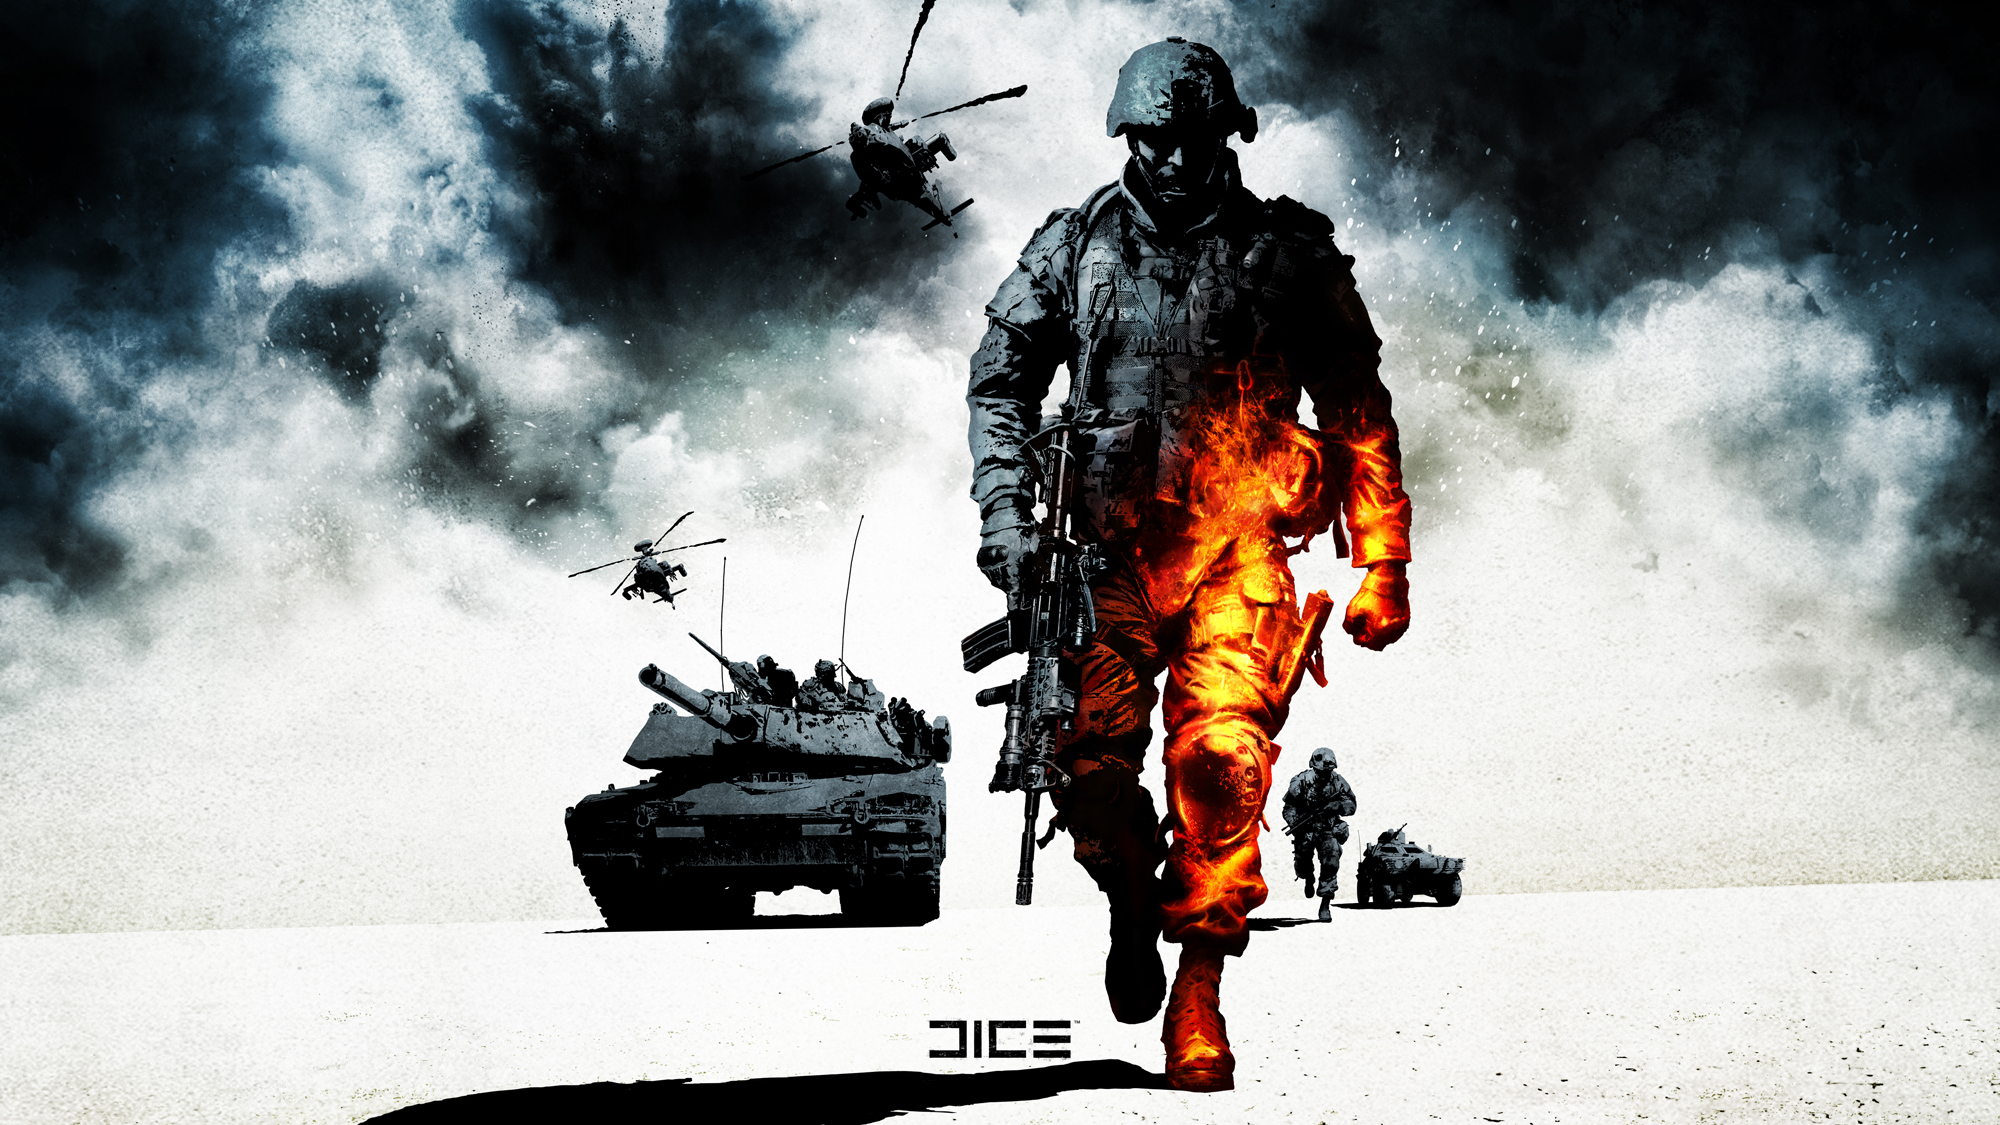 BattlefieldBadCompany2 Multi Art001